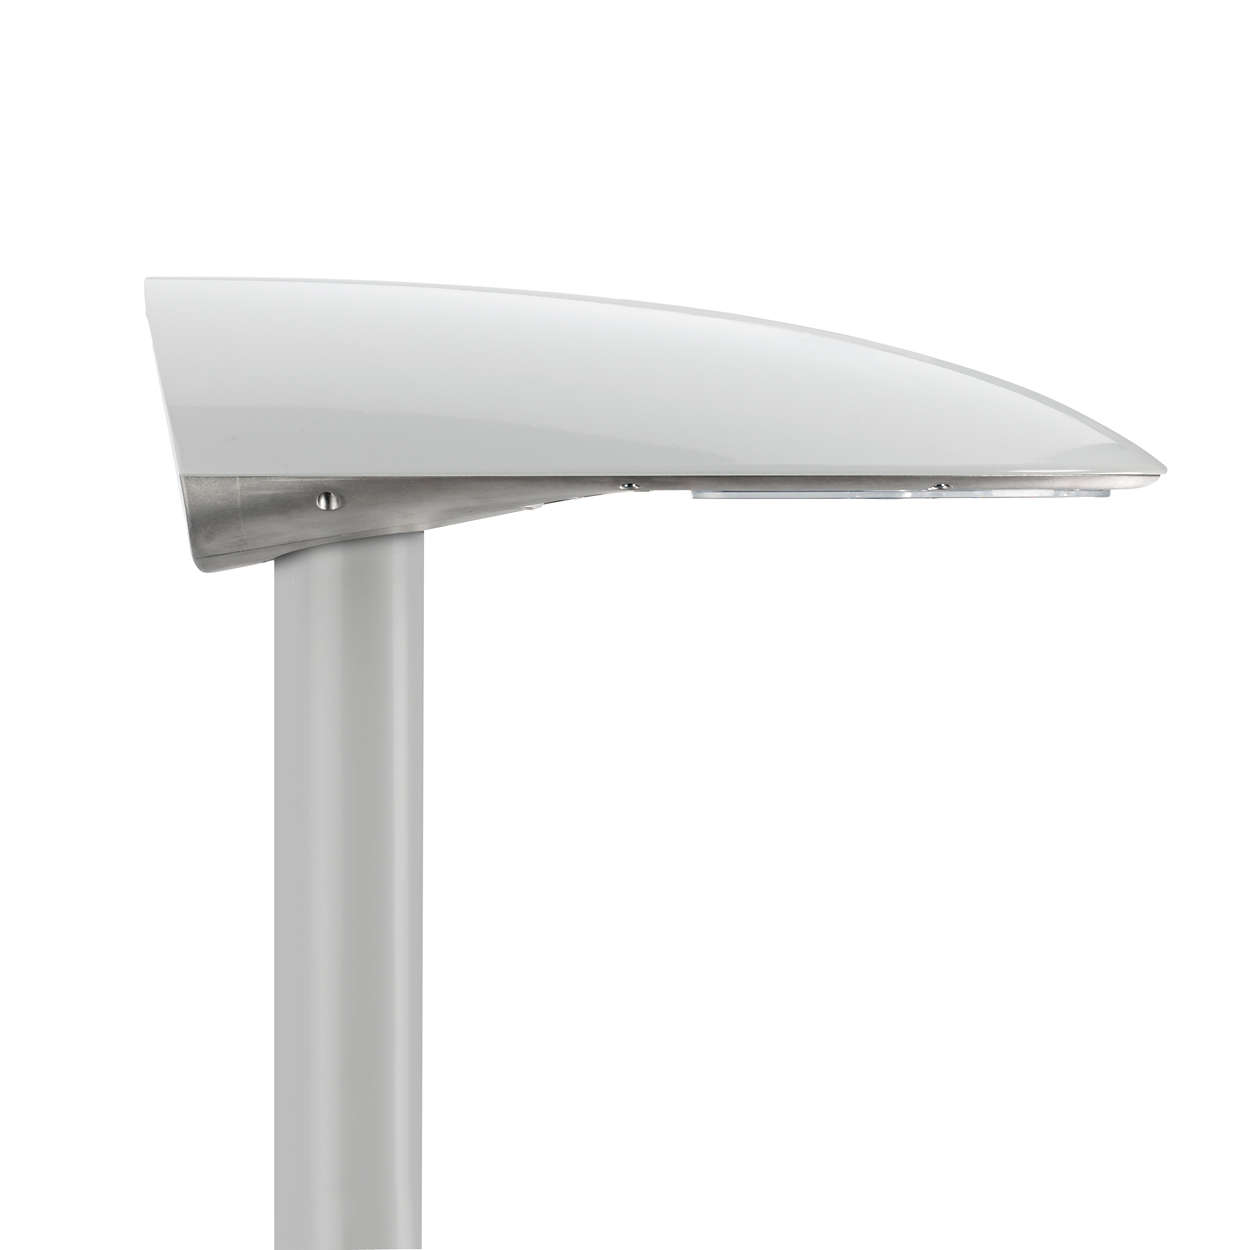 Iridium gen3 – The connected intelligent 'plug & play' road luminaire